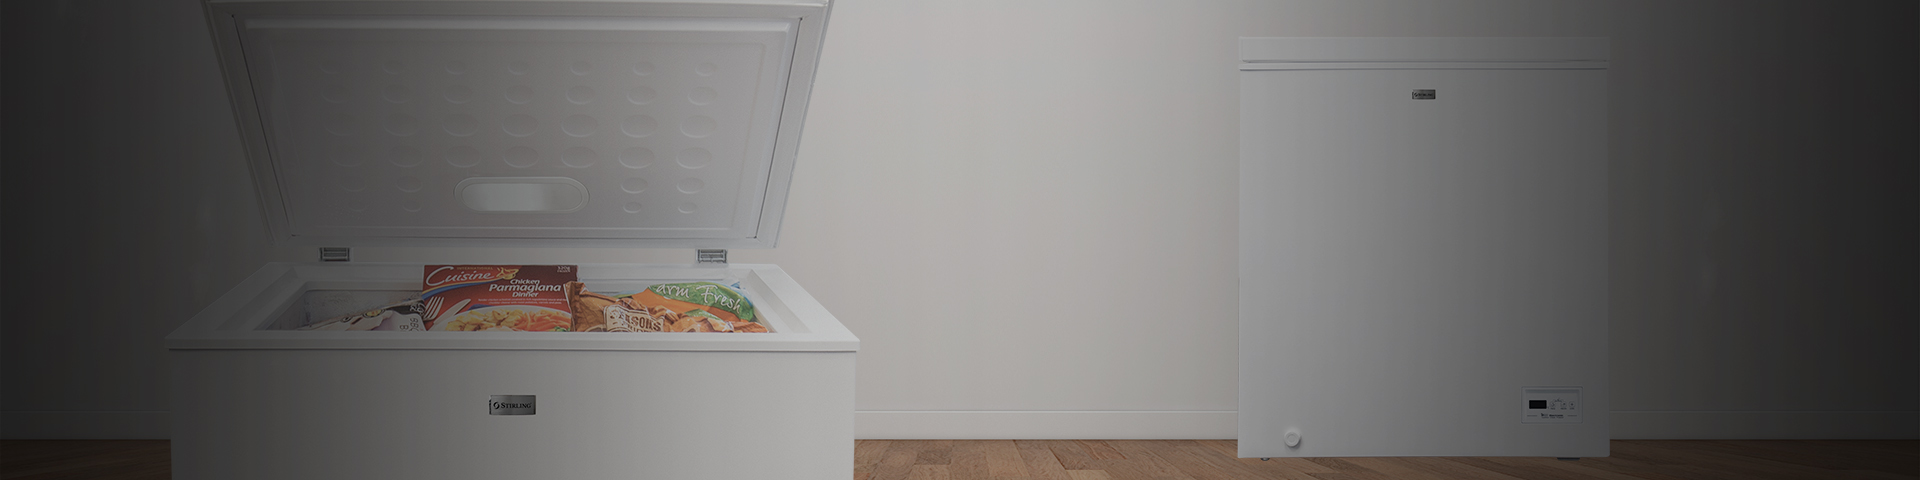 145L Chest Freezer - Banner - blank